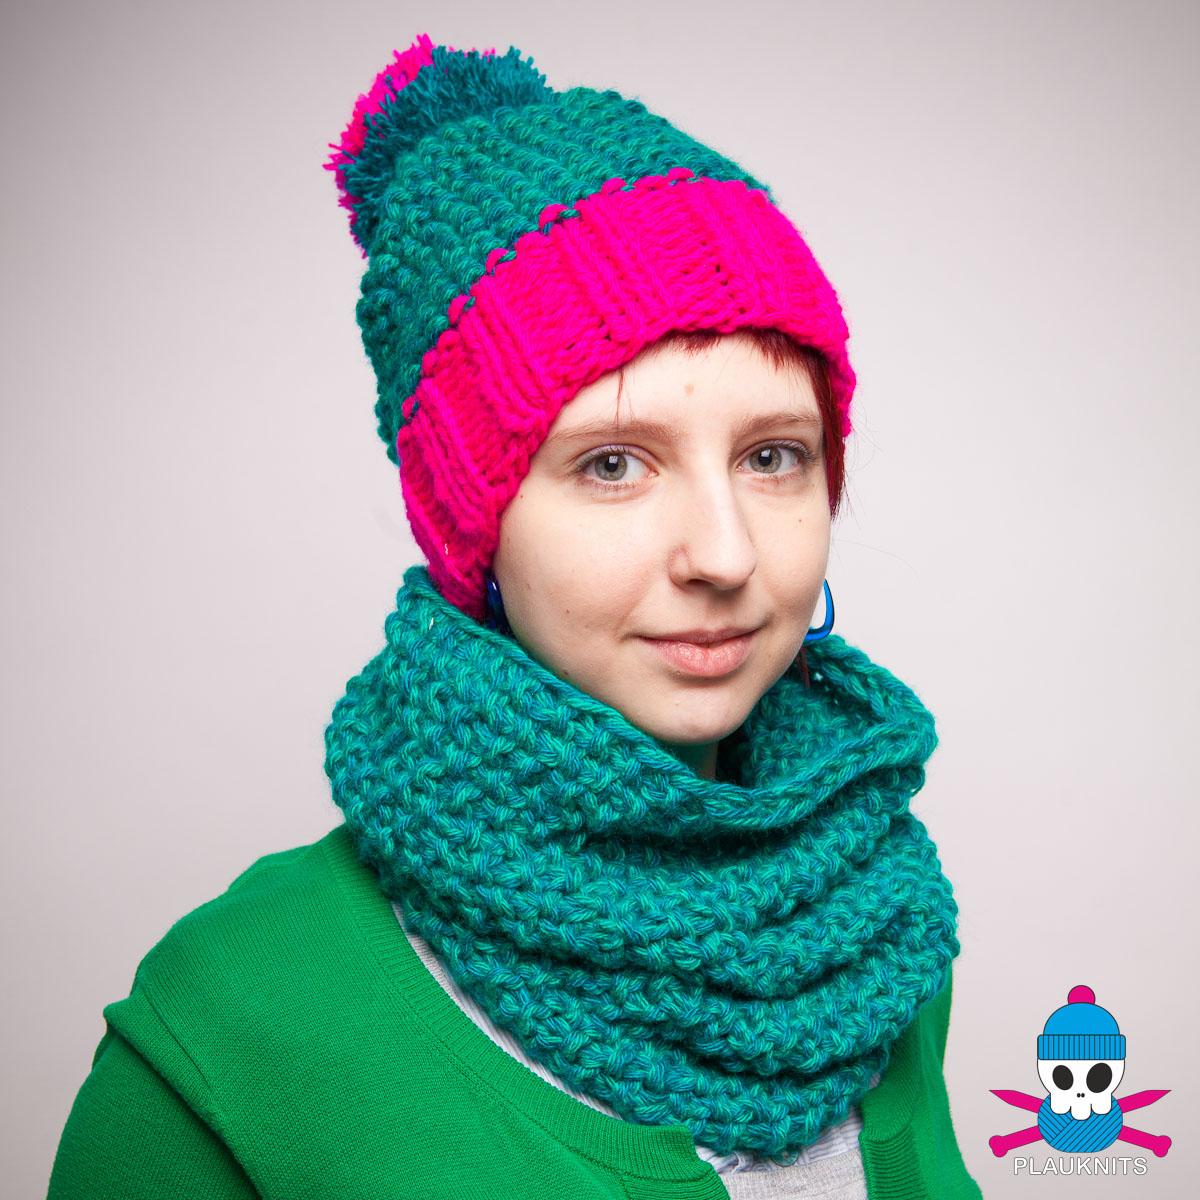 Зелёно-малиновый вязаный комплект шарф-снуд и шапка Катион